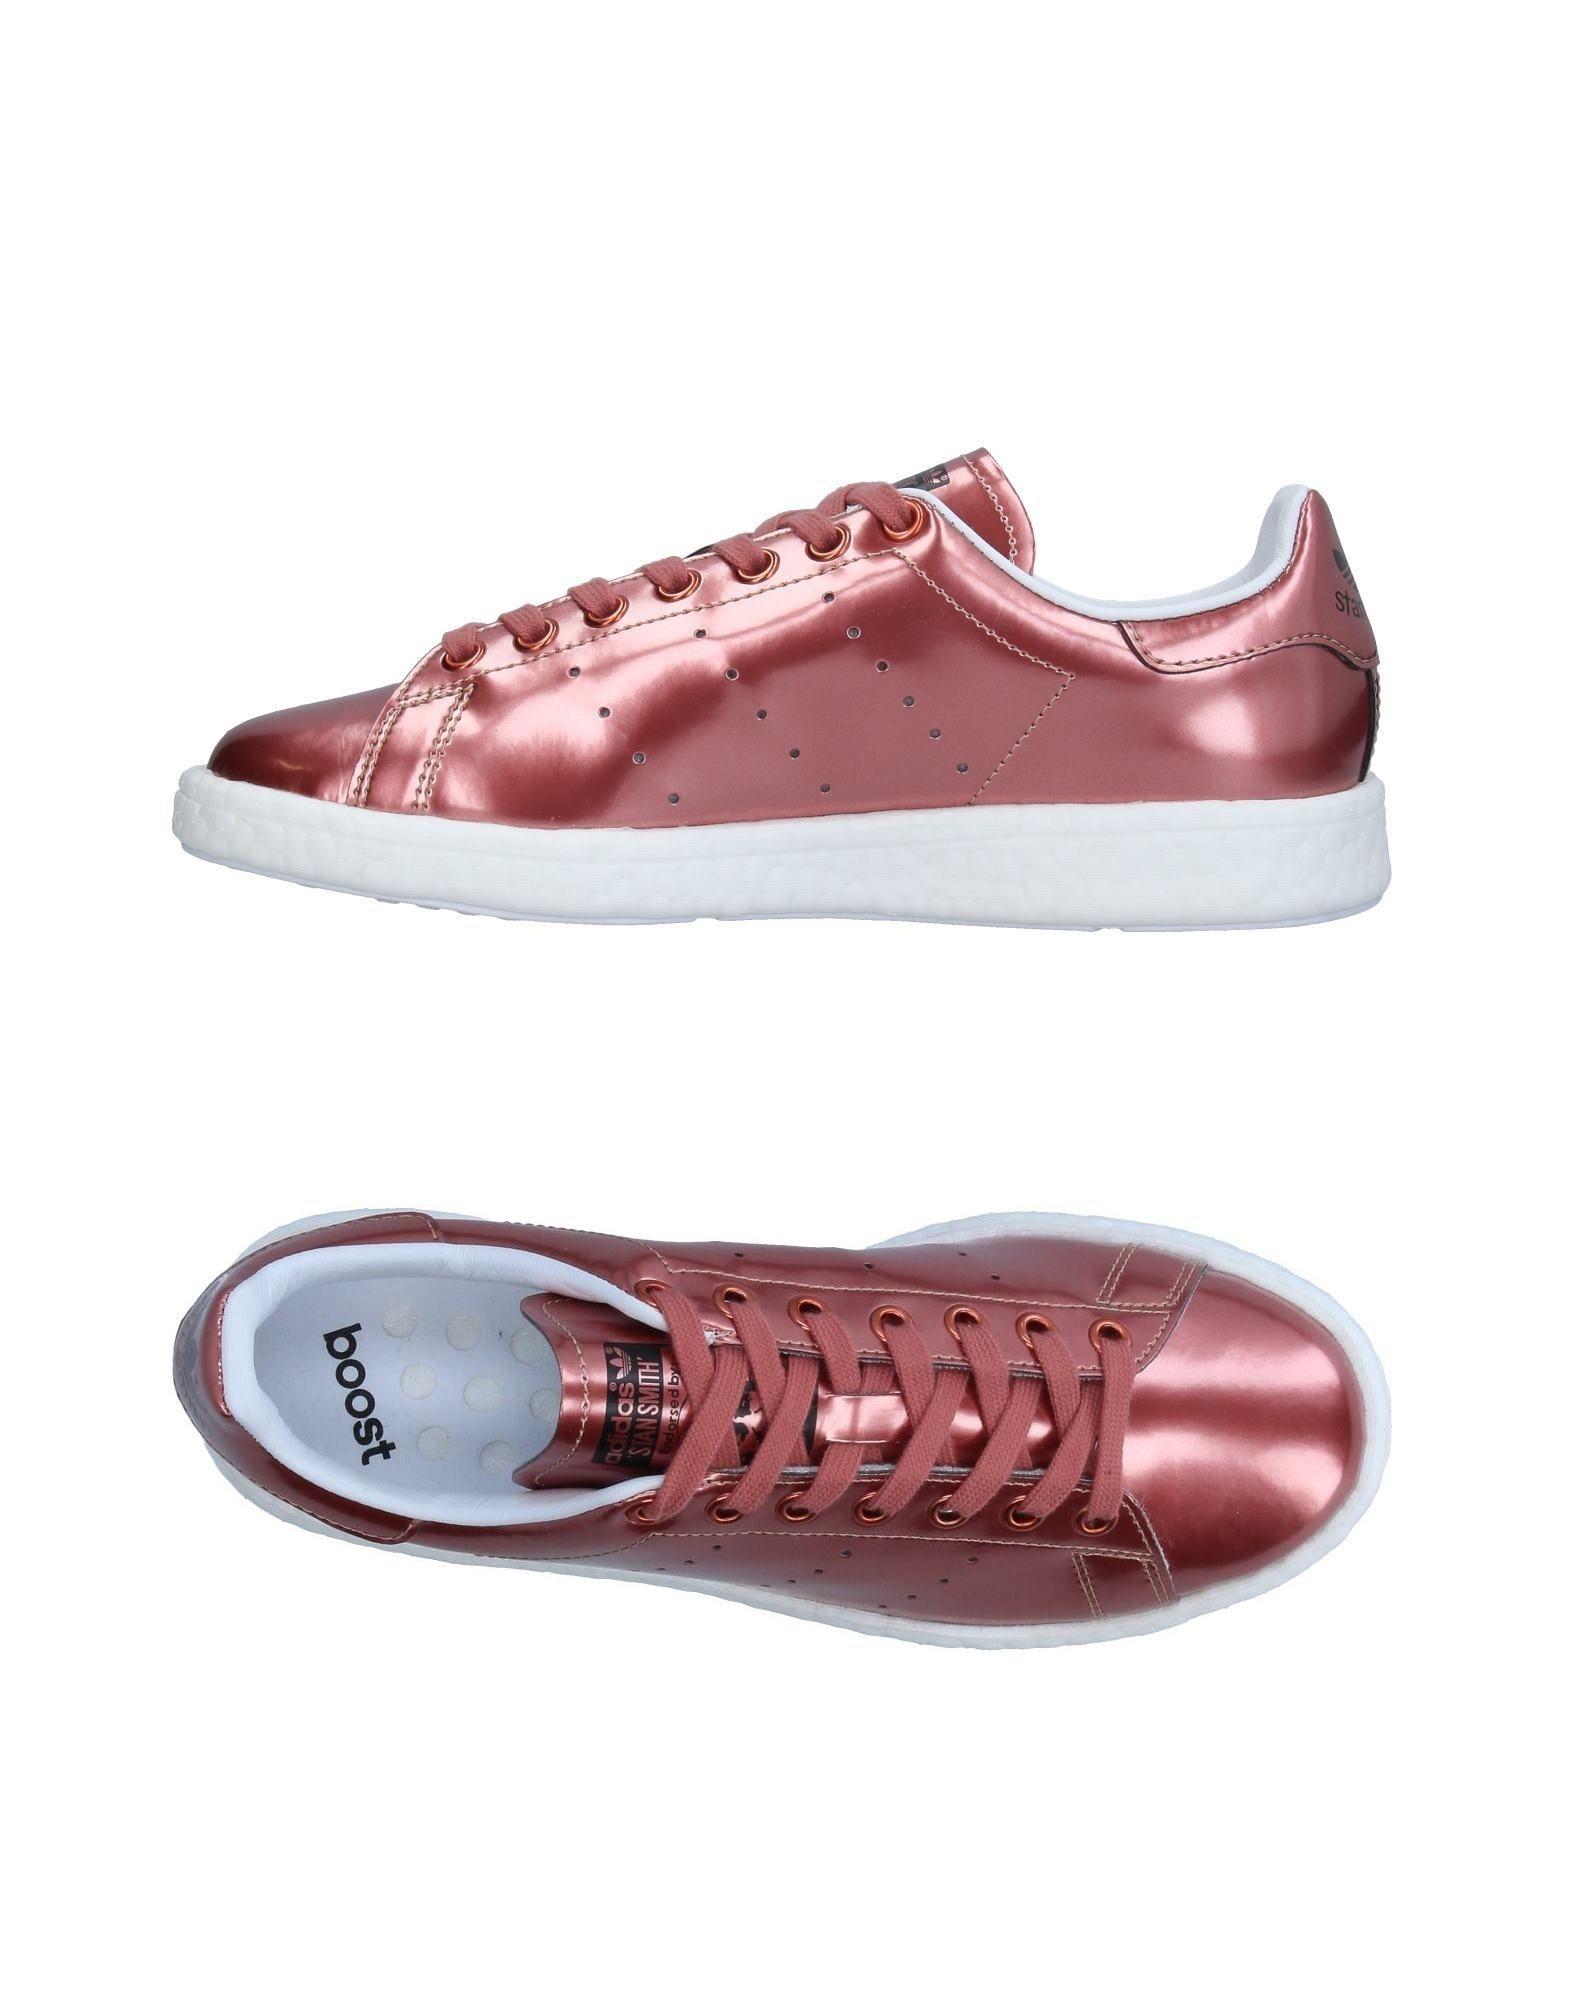 Adidas Originals Sneakers - Women Adidas  Originals Sneakers online on  Adidas United Kingdom - 11333471VE 9884a5